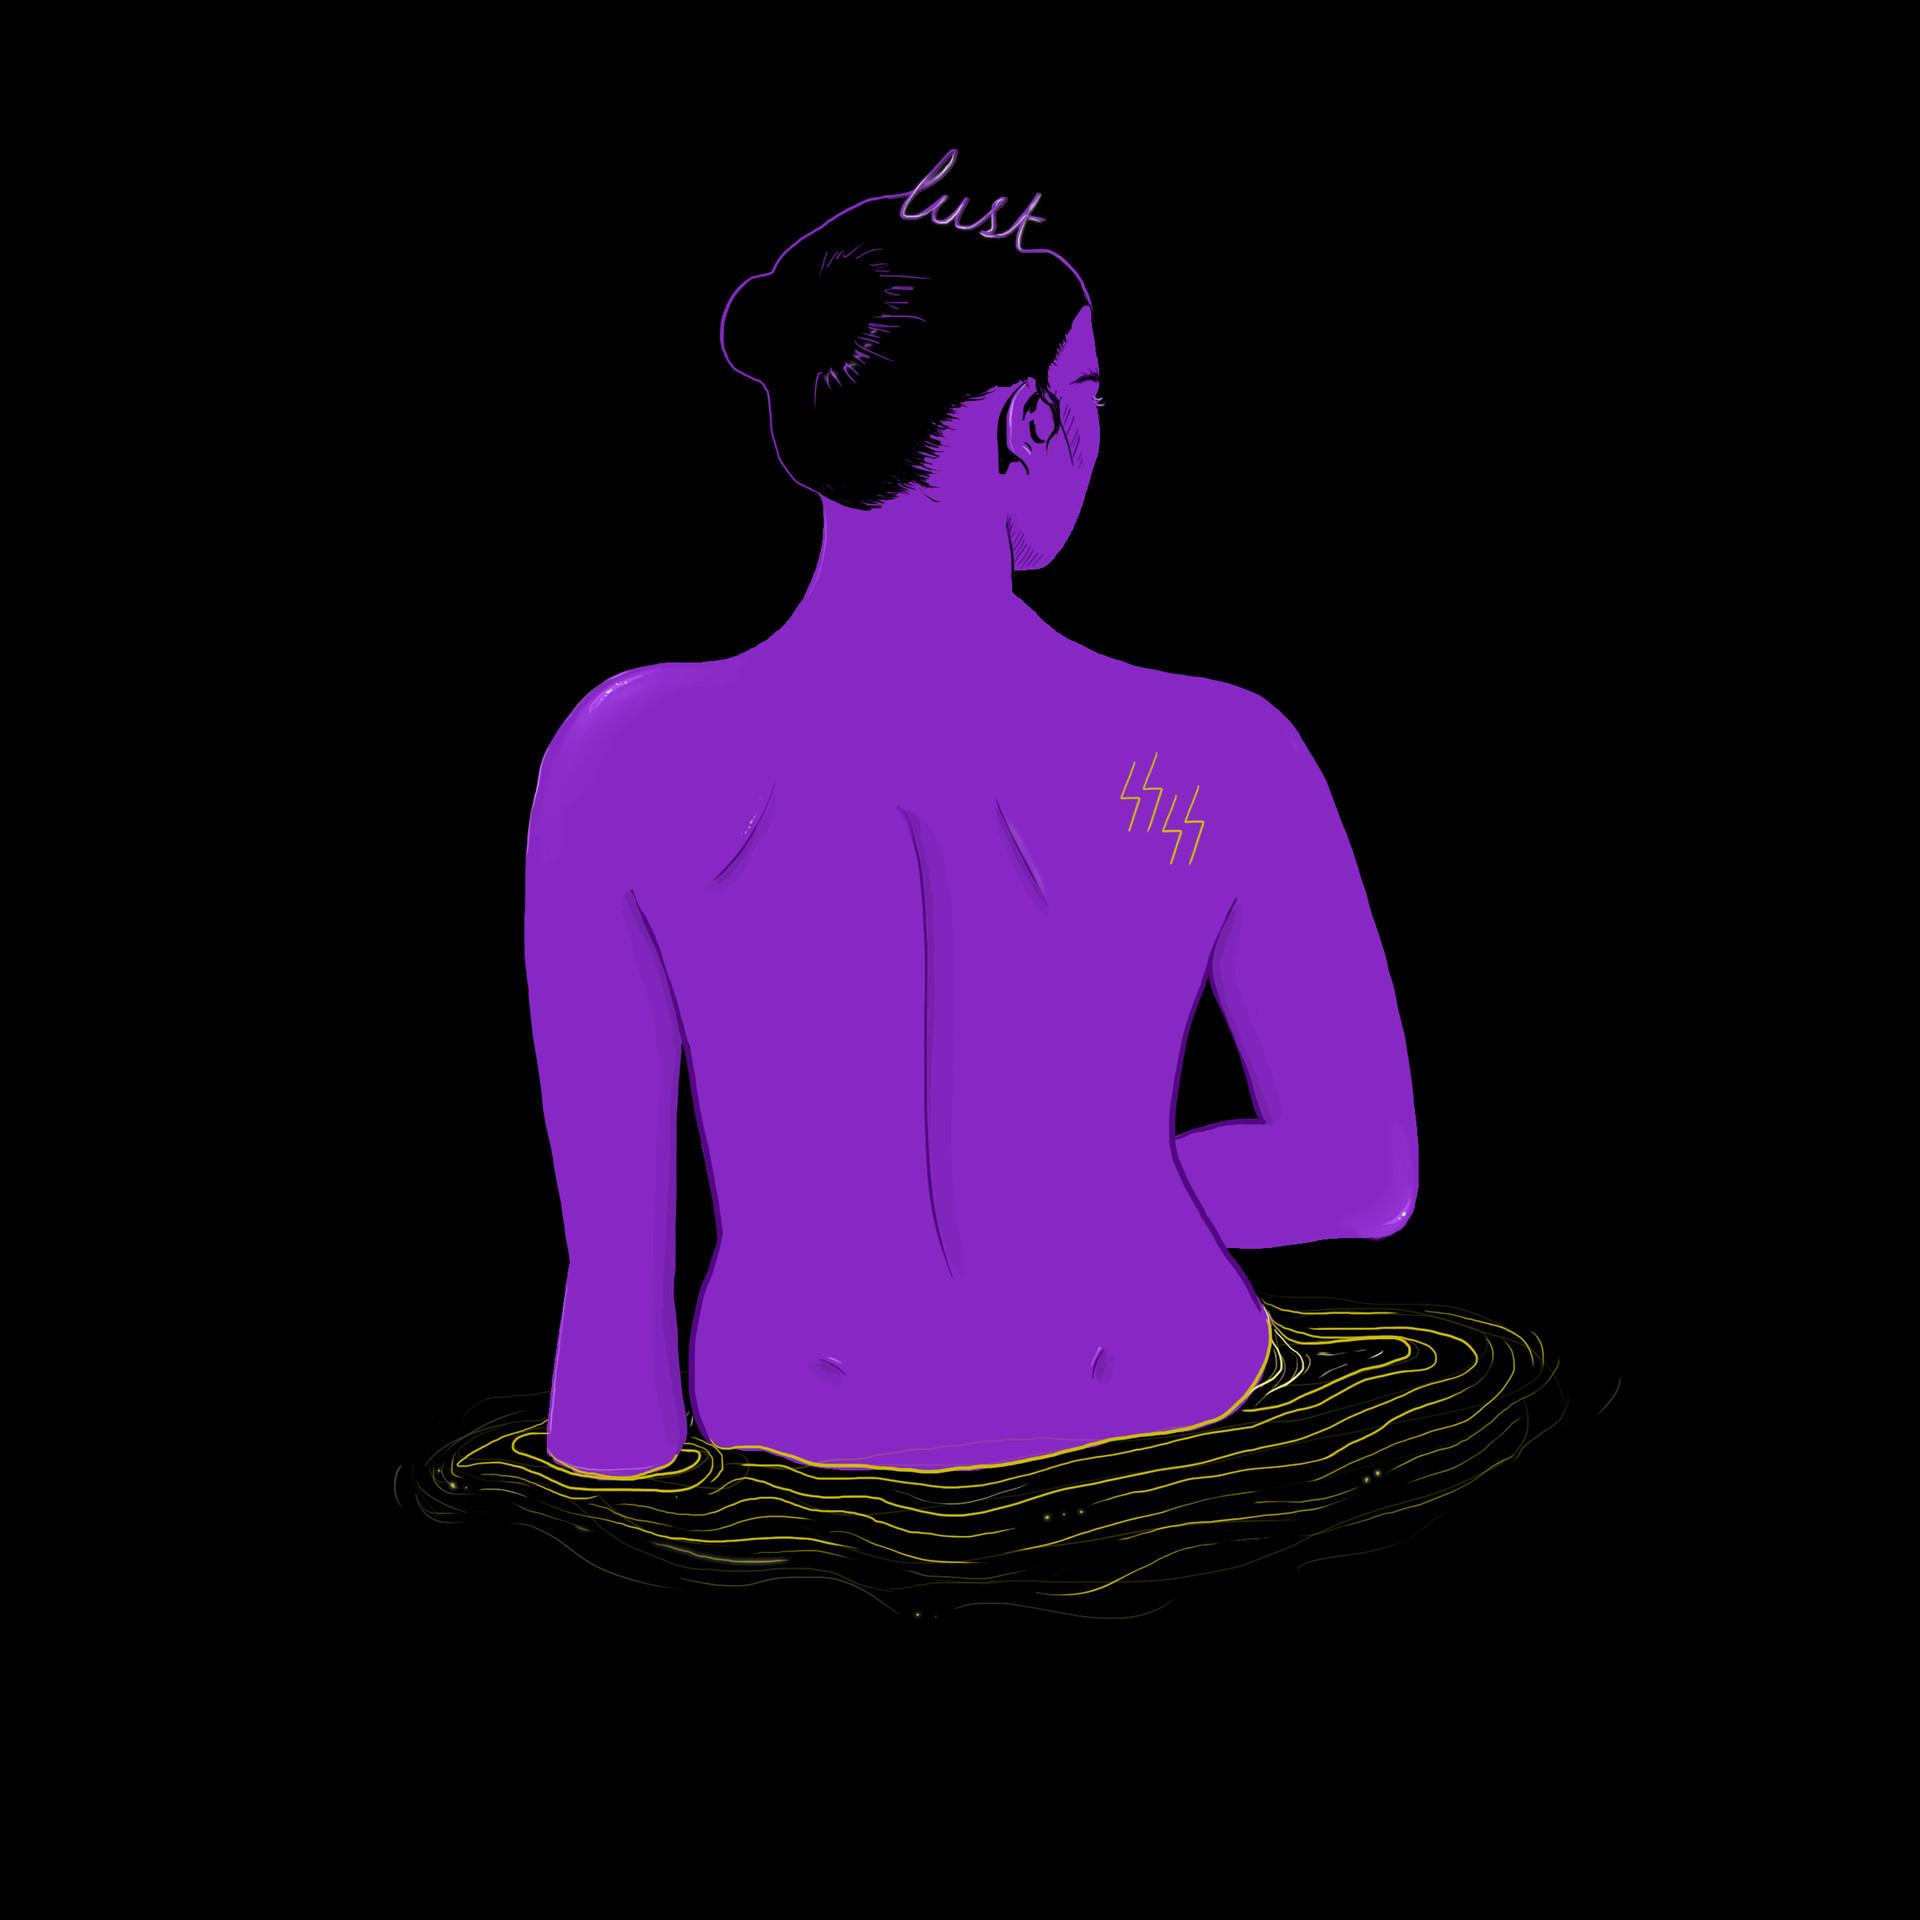 Lust (Single) - Sista Strange